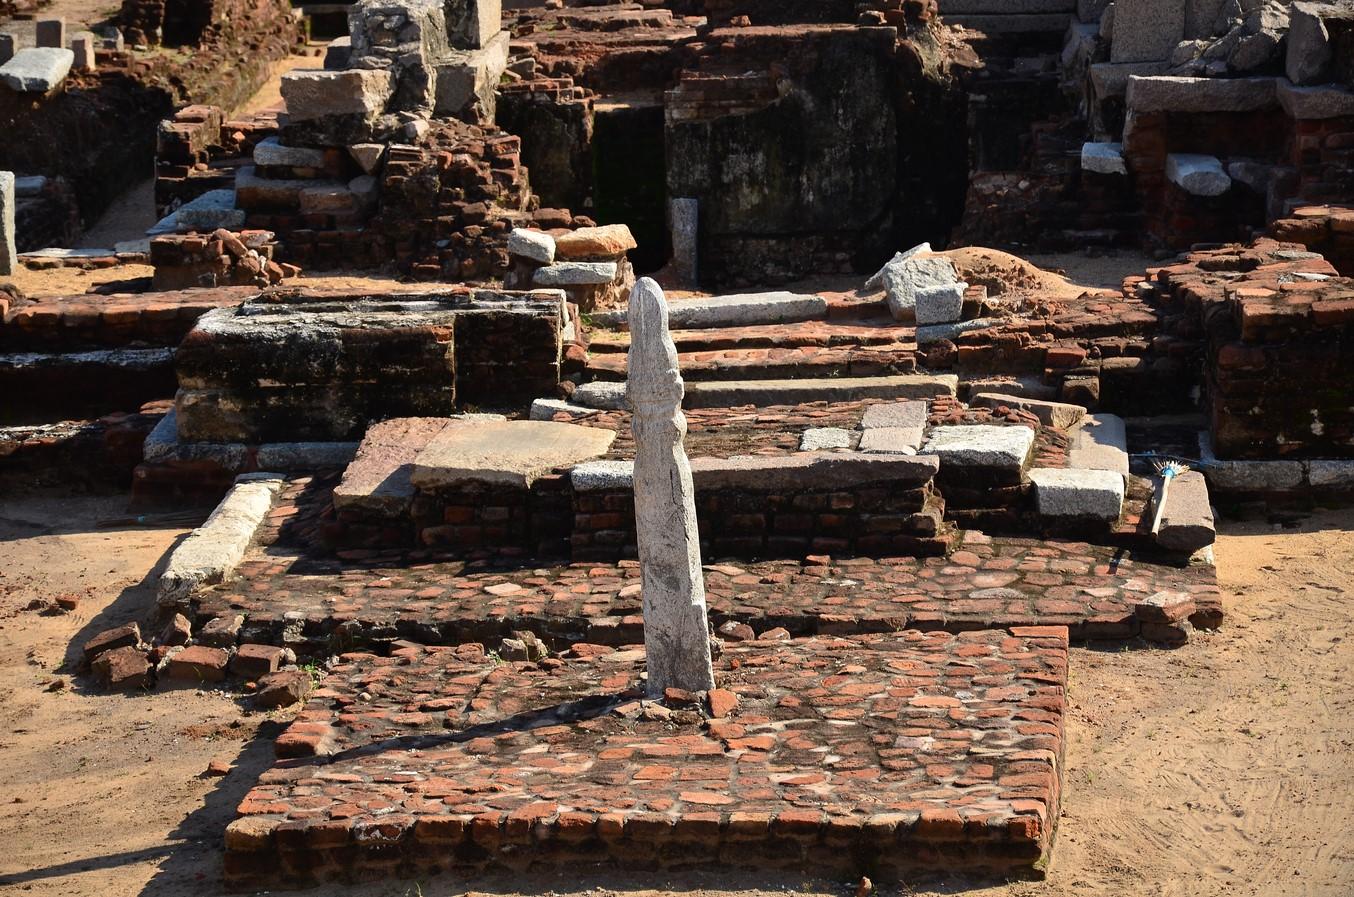 Saluvankuppam Murugan Temple: Oldest Murugan Temple on Earth - Sheet2